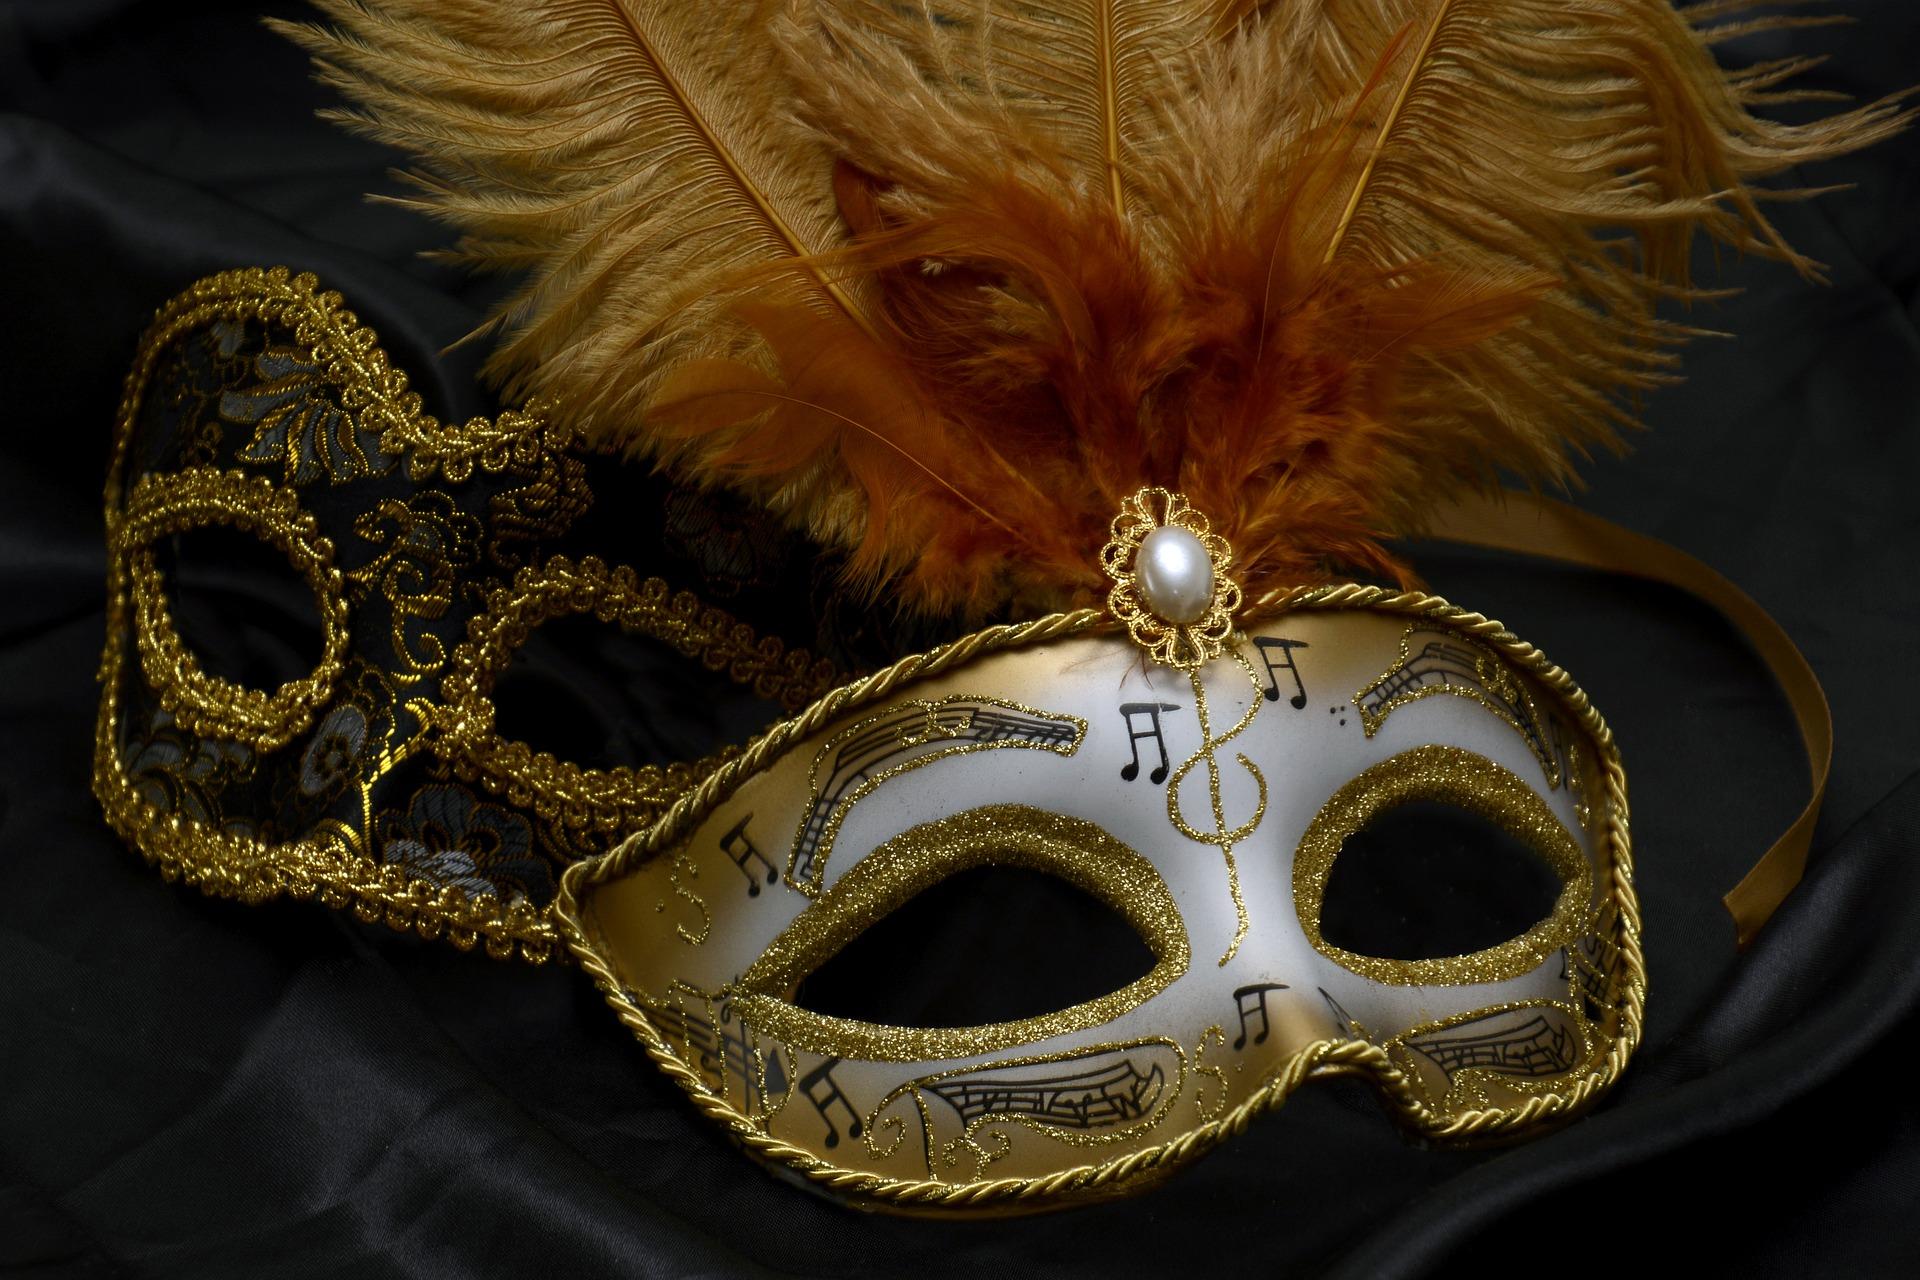 mask-2014551_1920.jpg